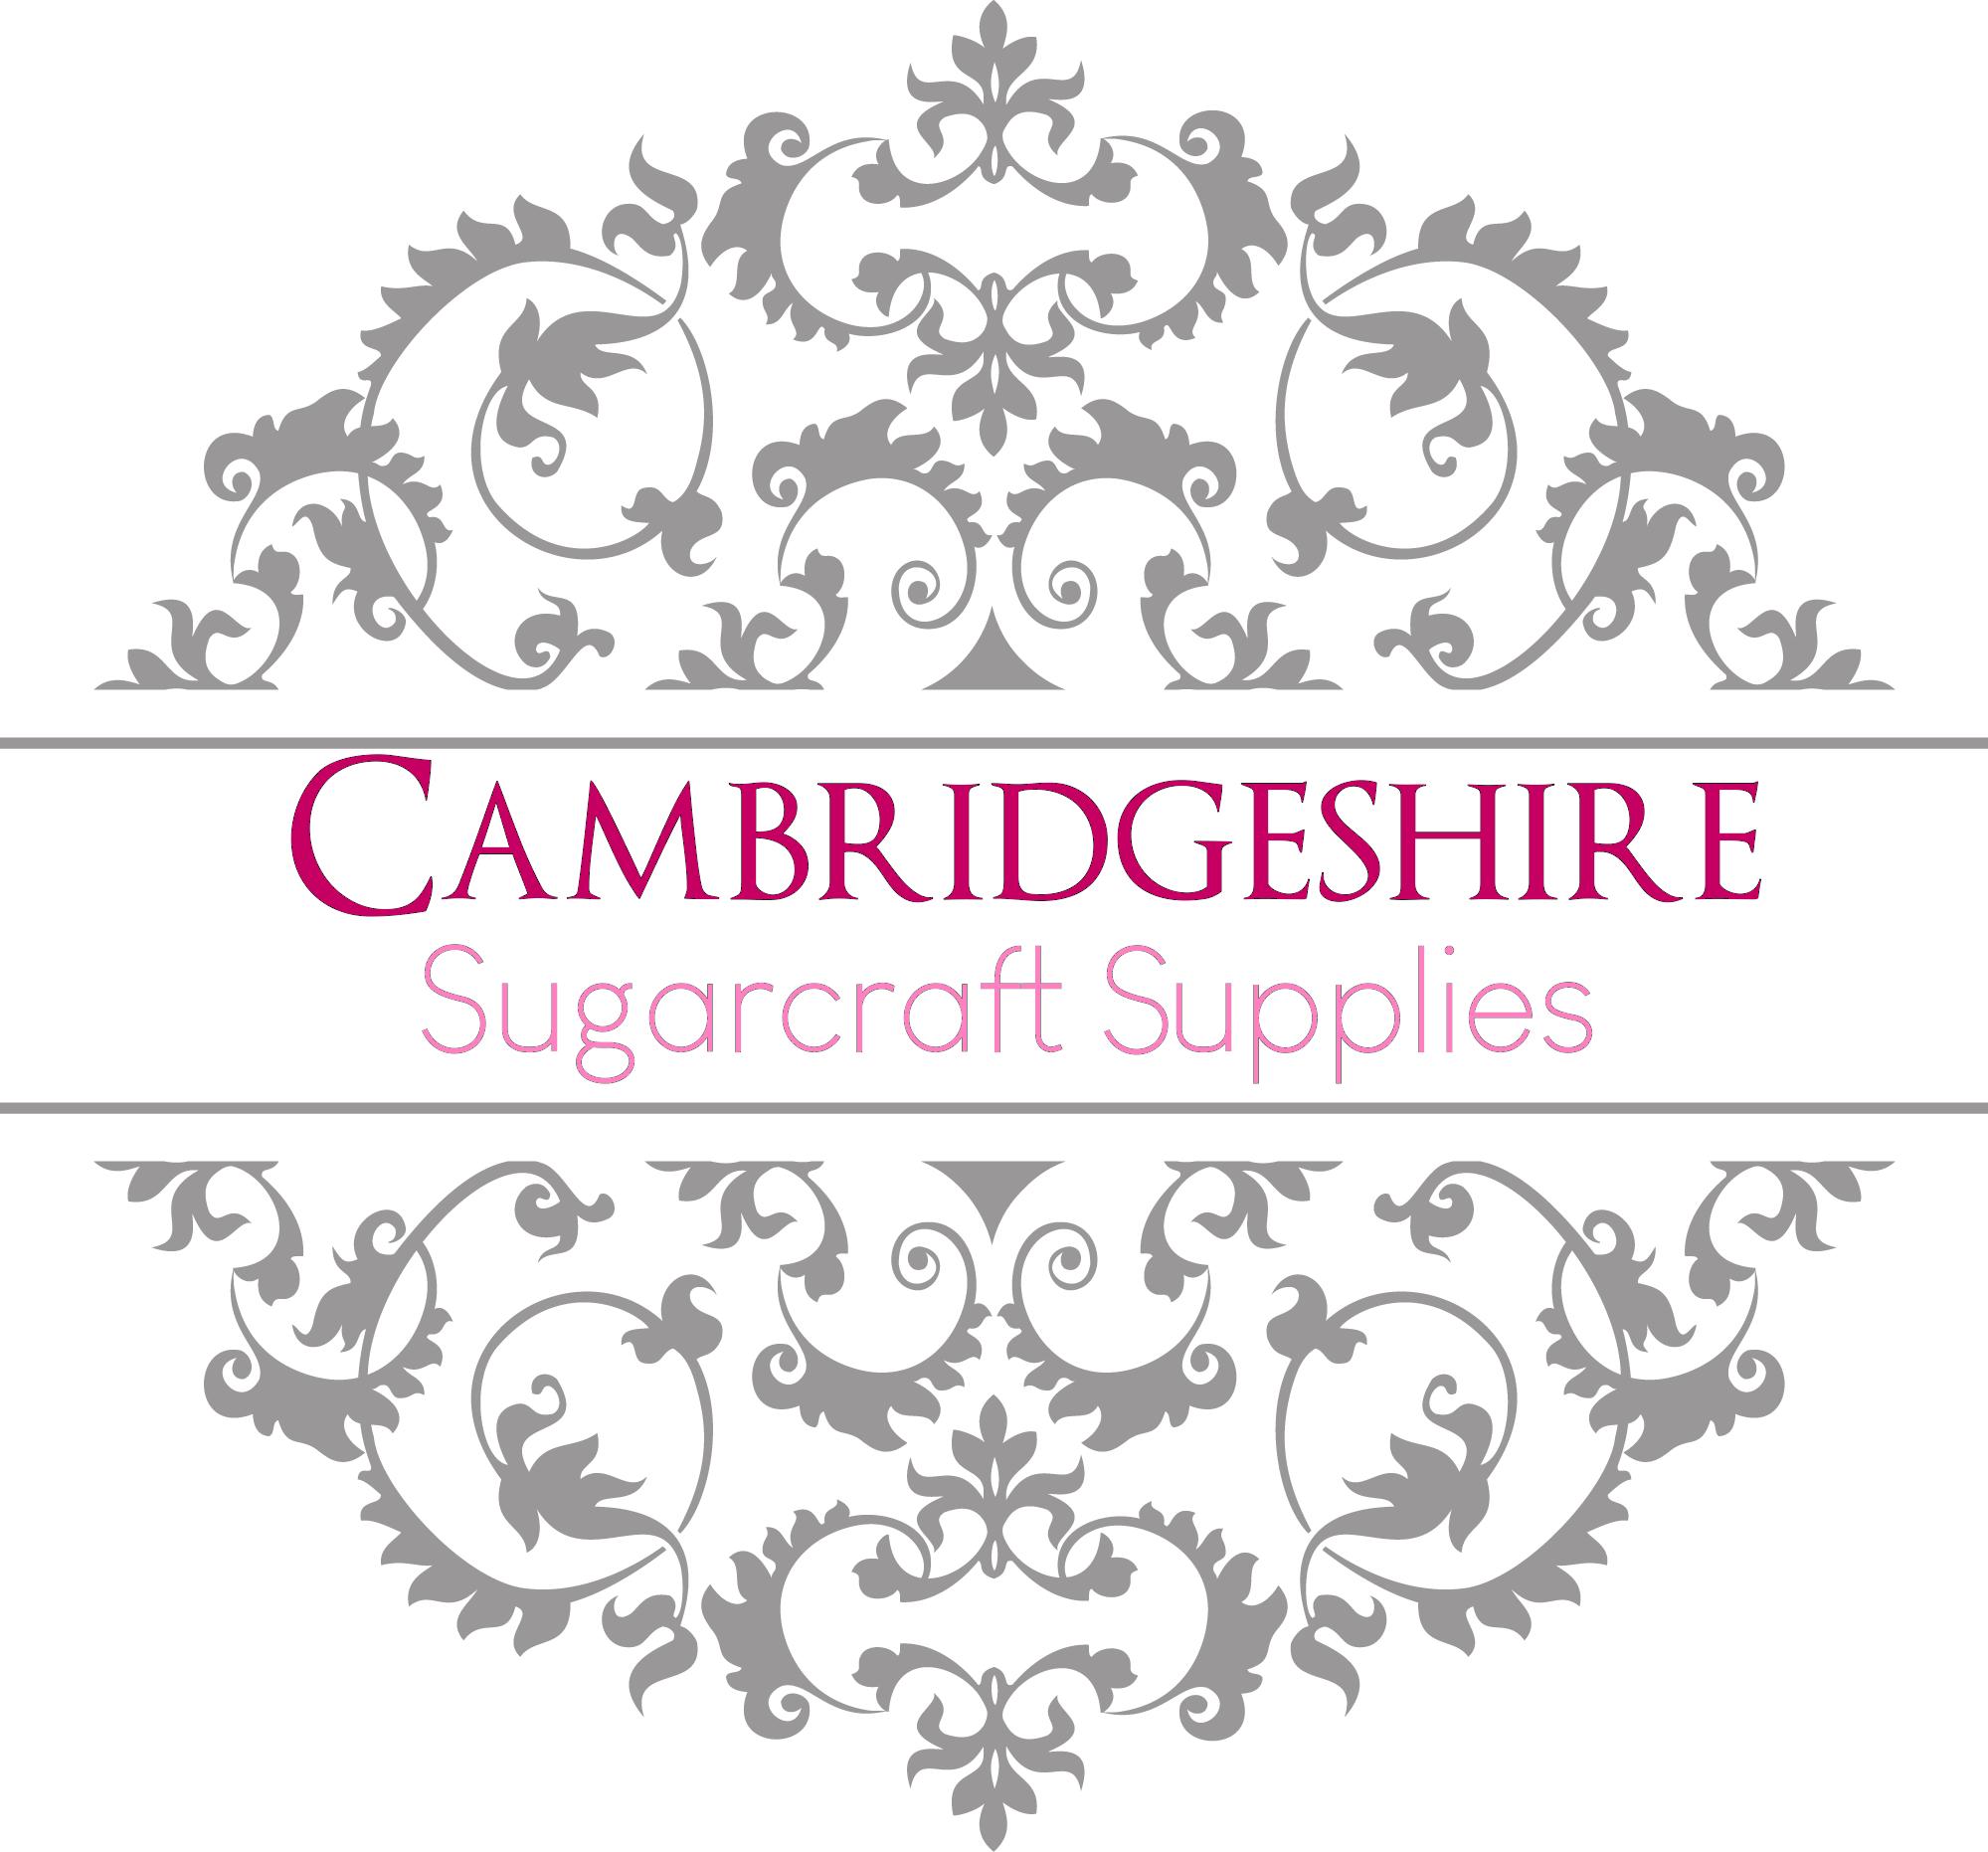 Cambridgeshire Sugarcraft Supplies - Yaxley, Peterborough, Cambridgeshire PE7 3GR - 01733 245451   ShowMeLocal.com